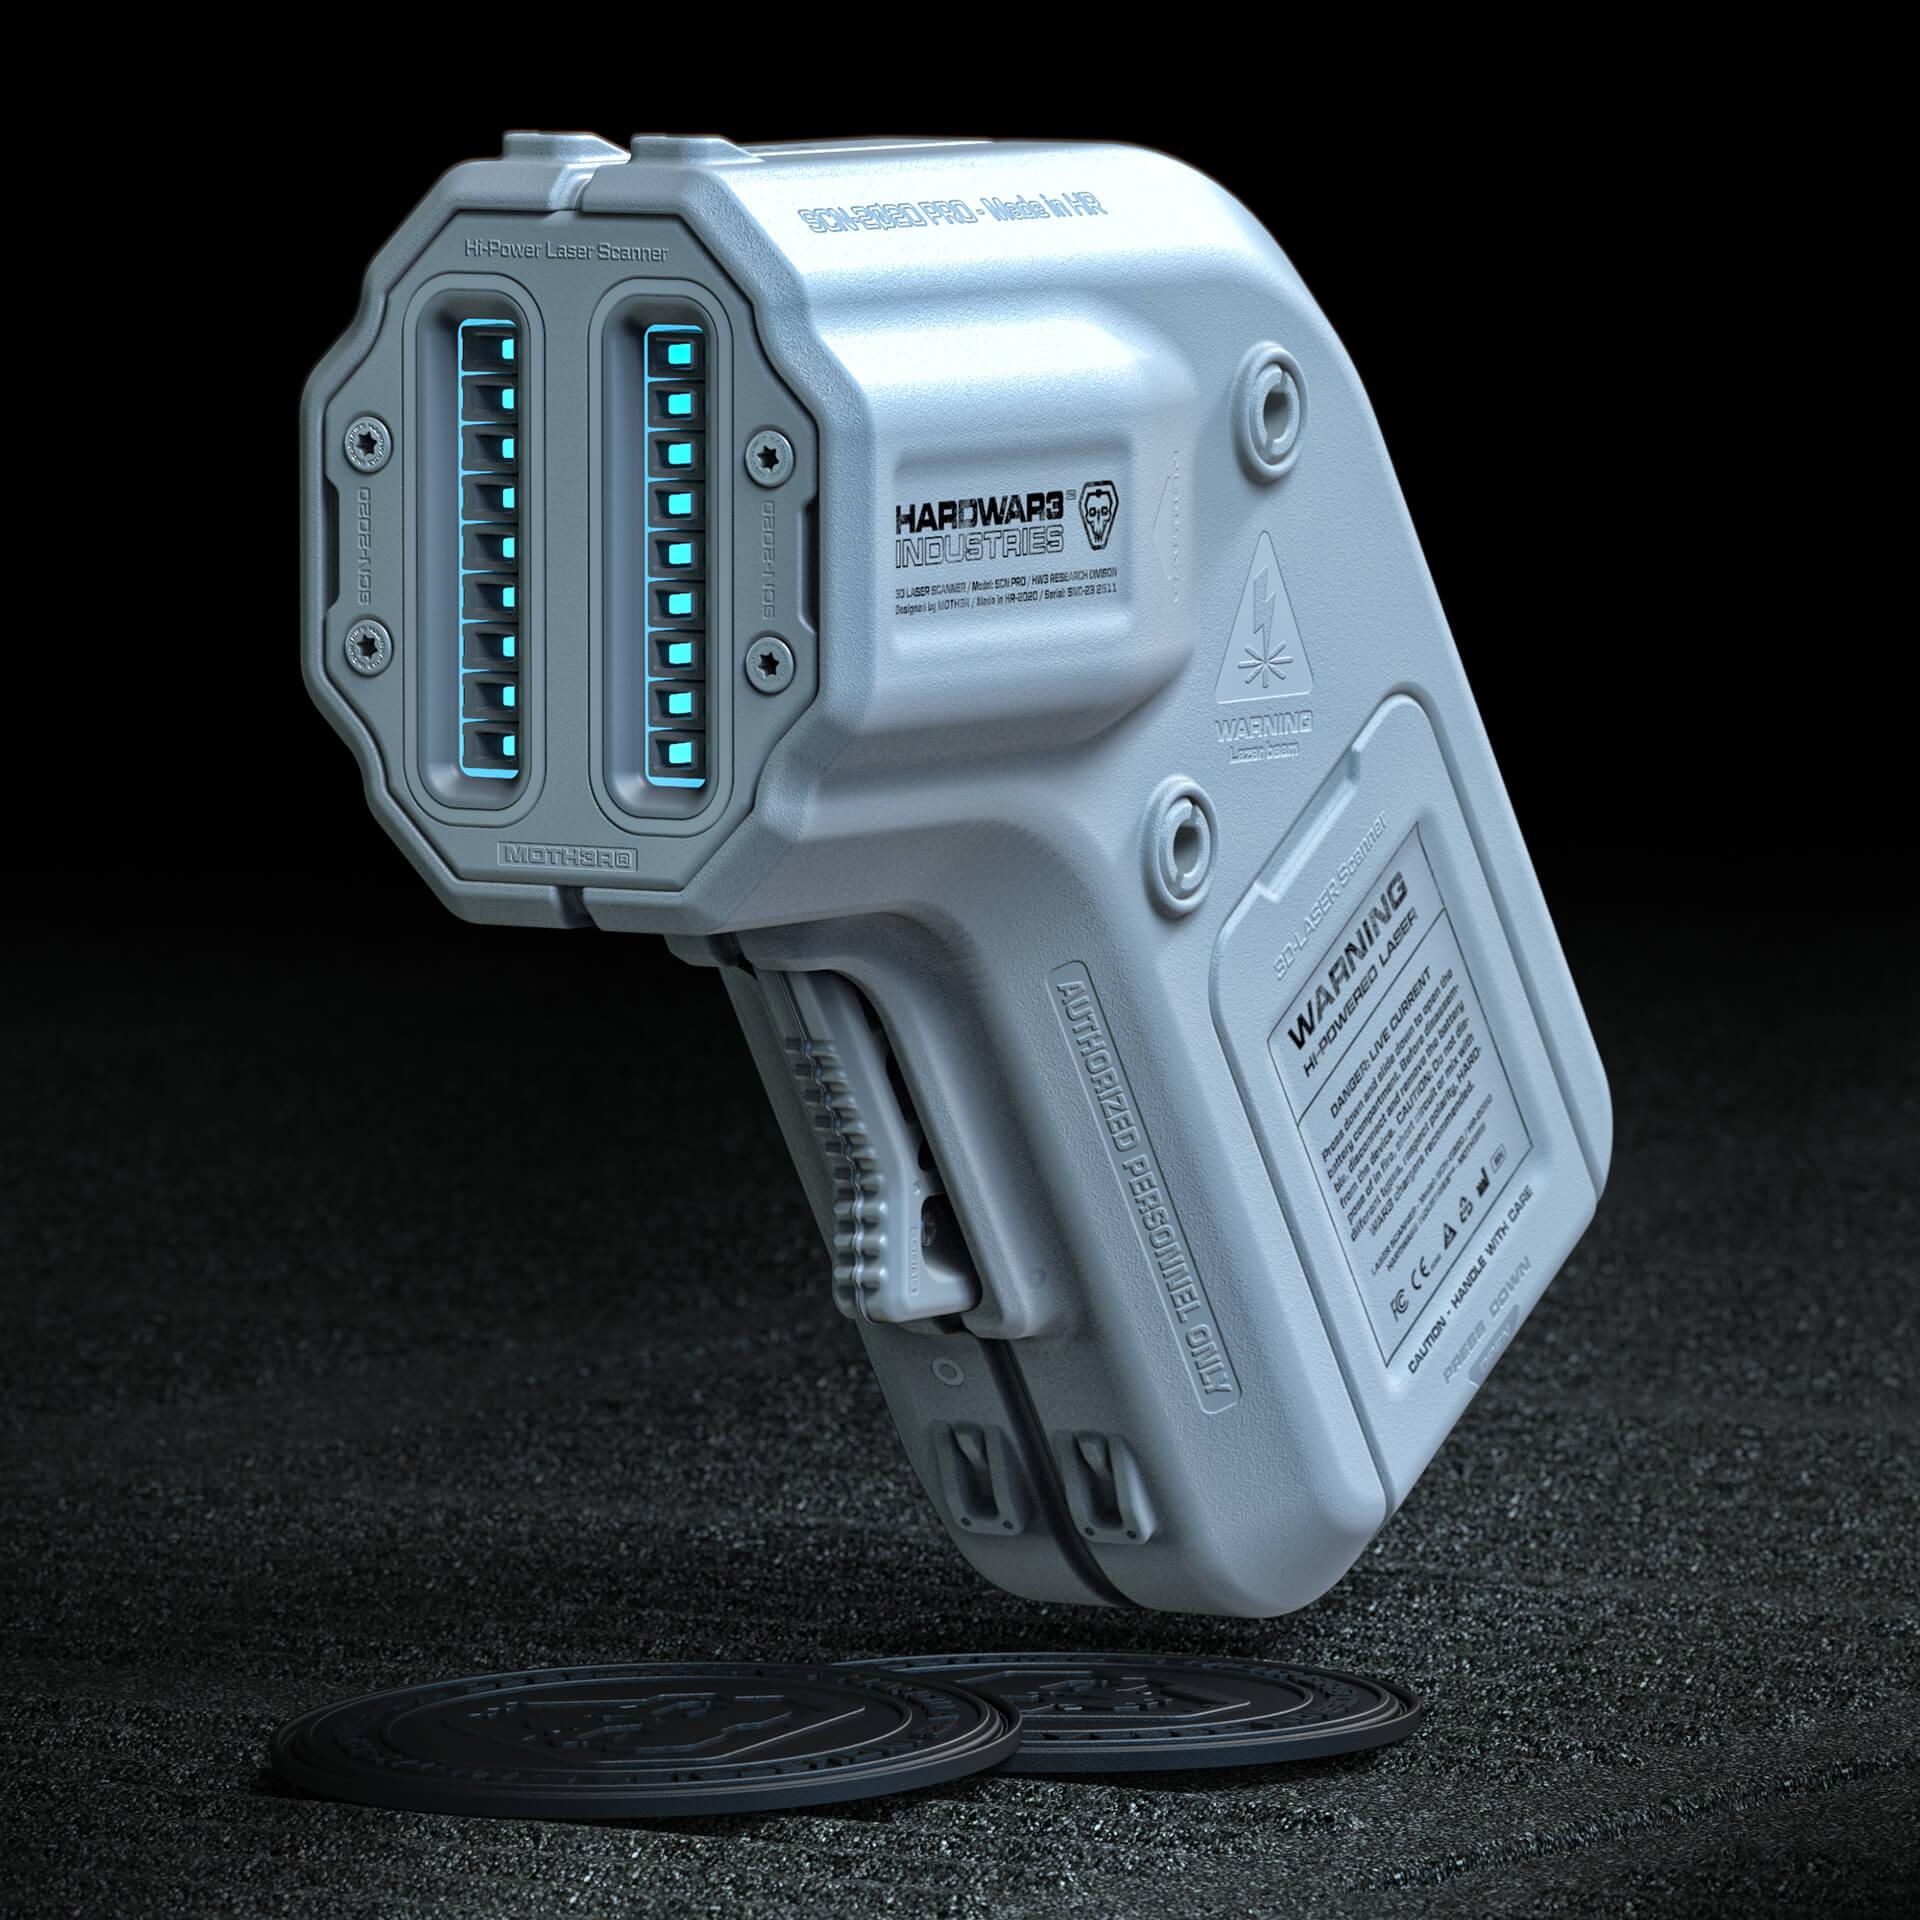 Scanner-001.96-Clean